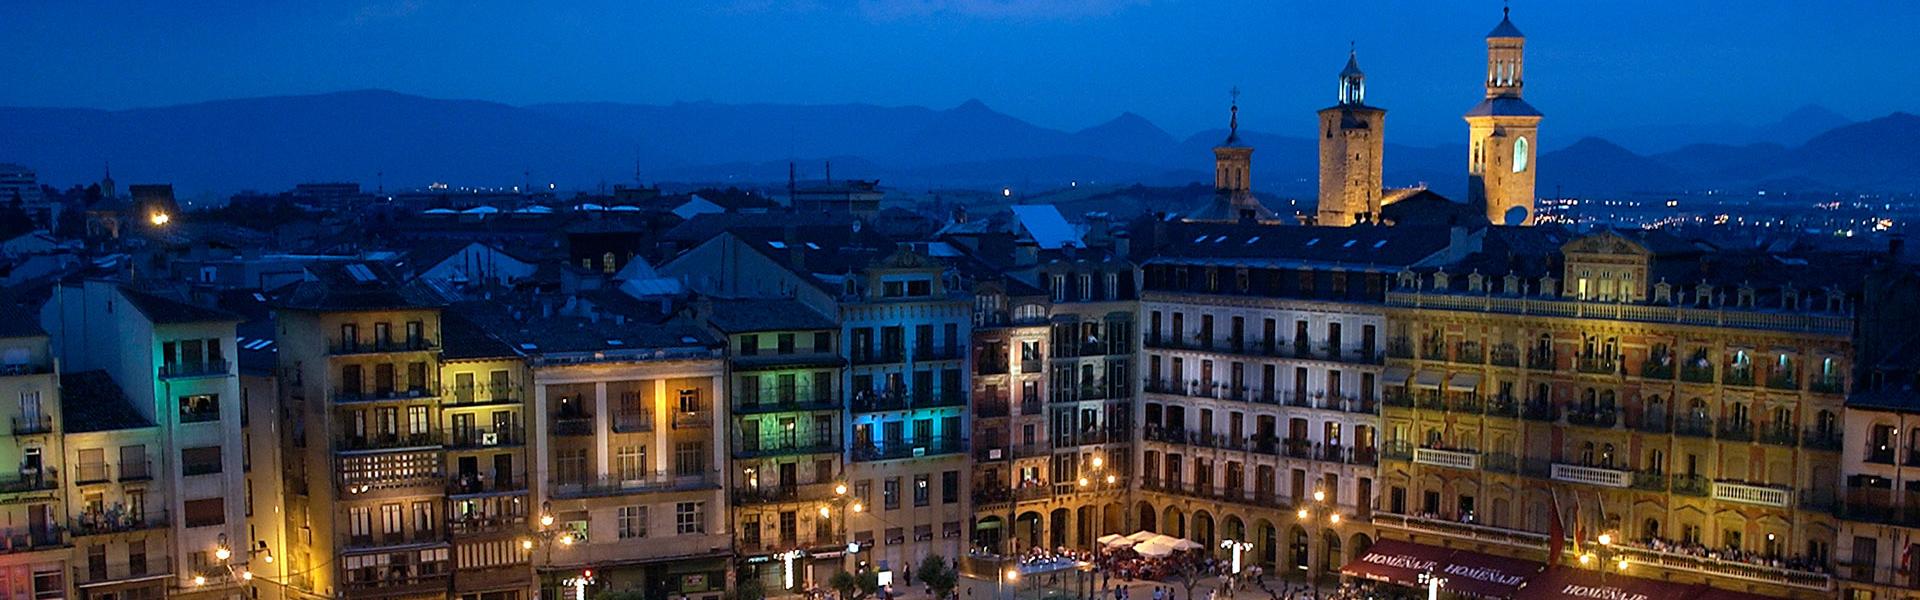 Pamplona la nuit